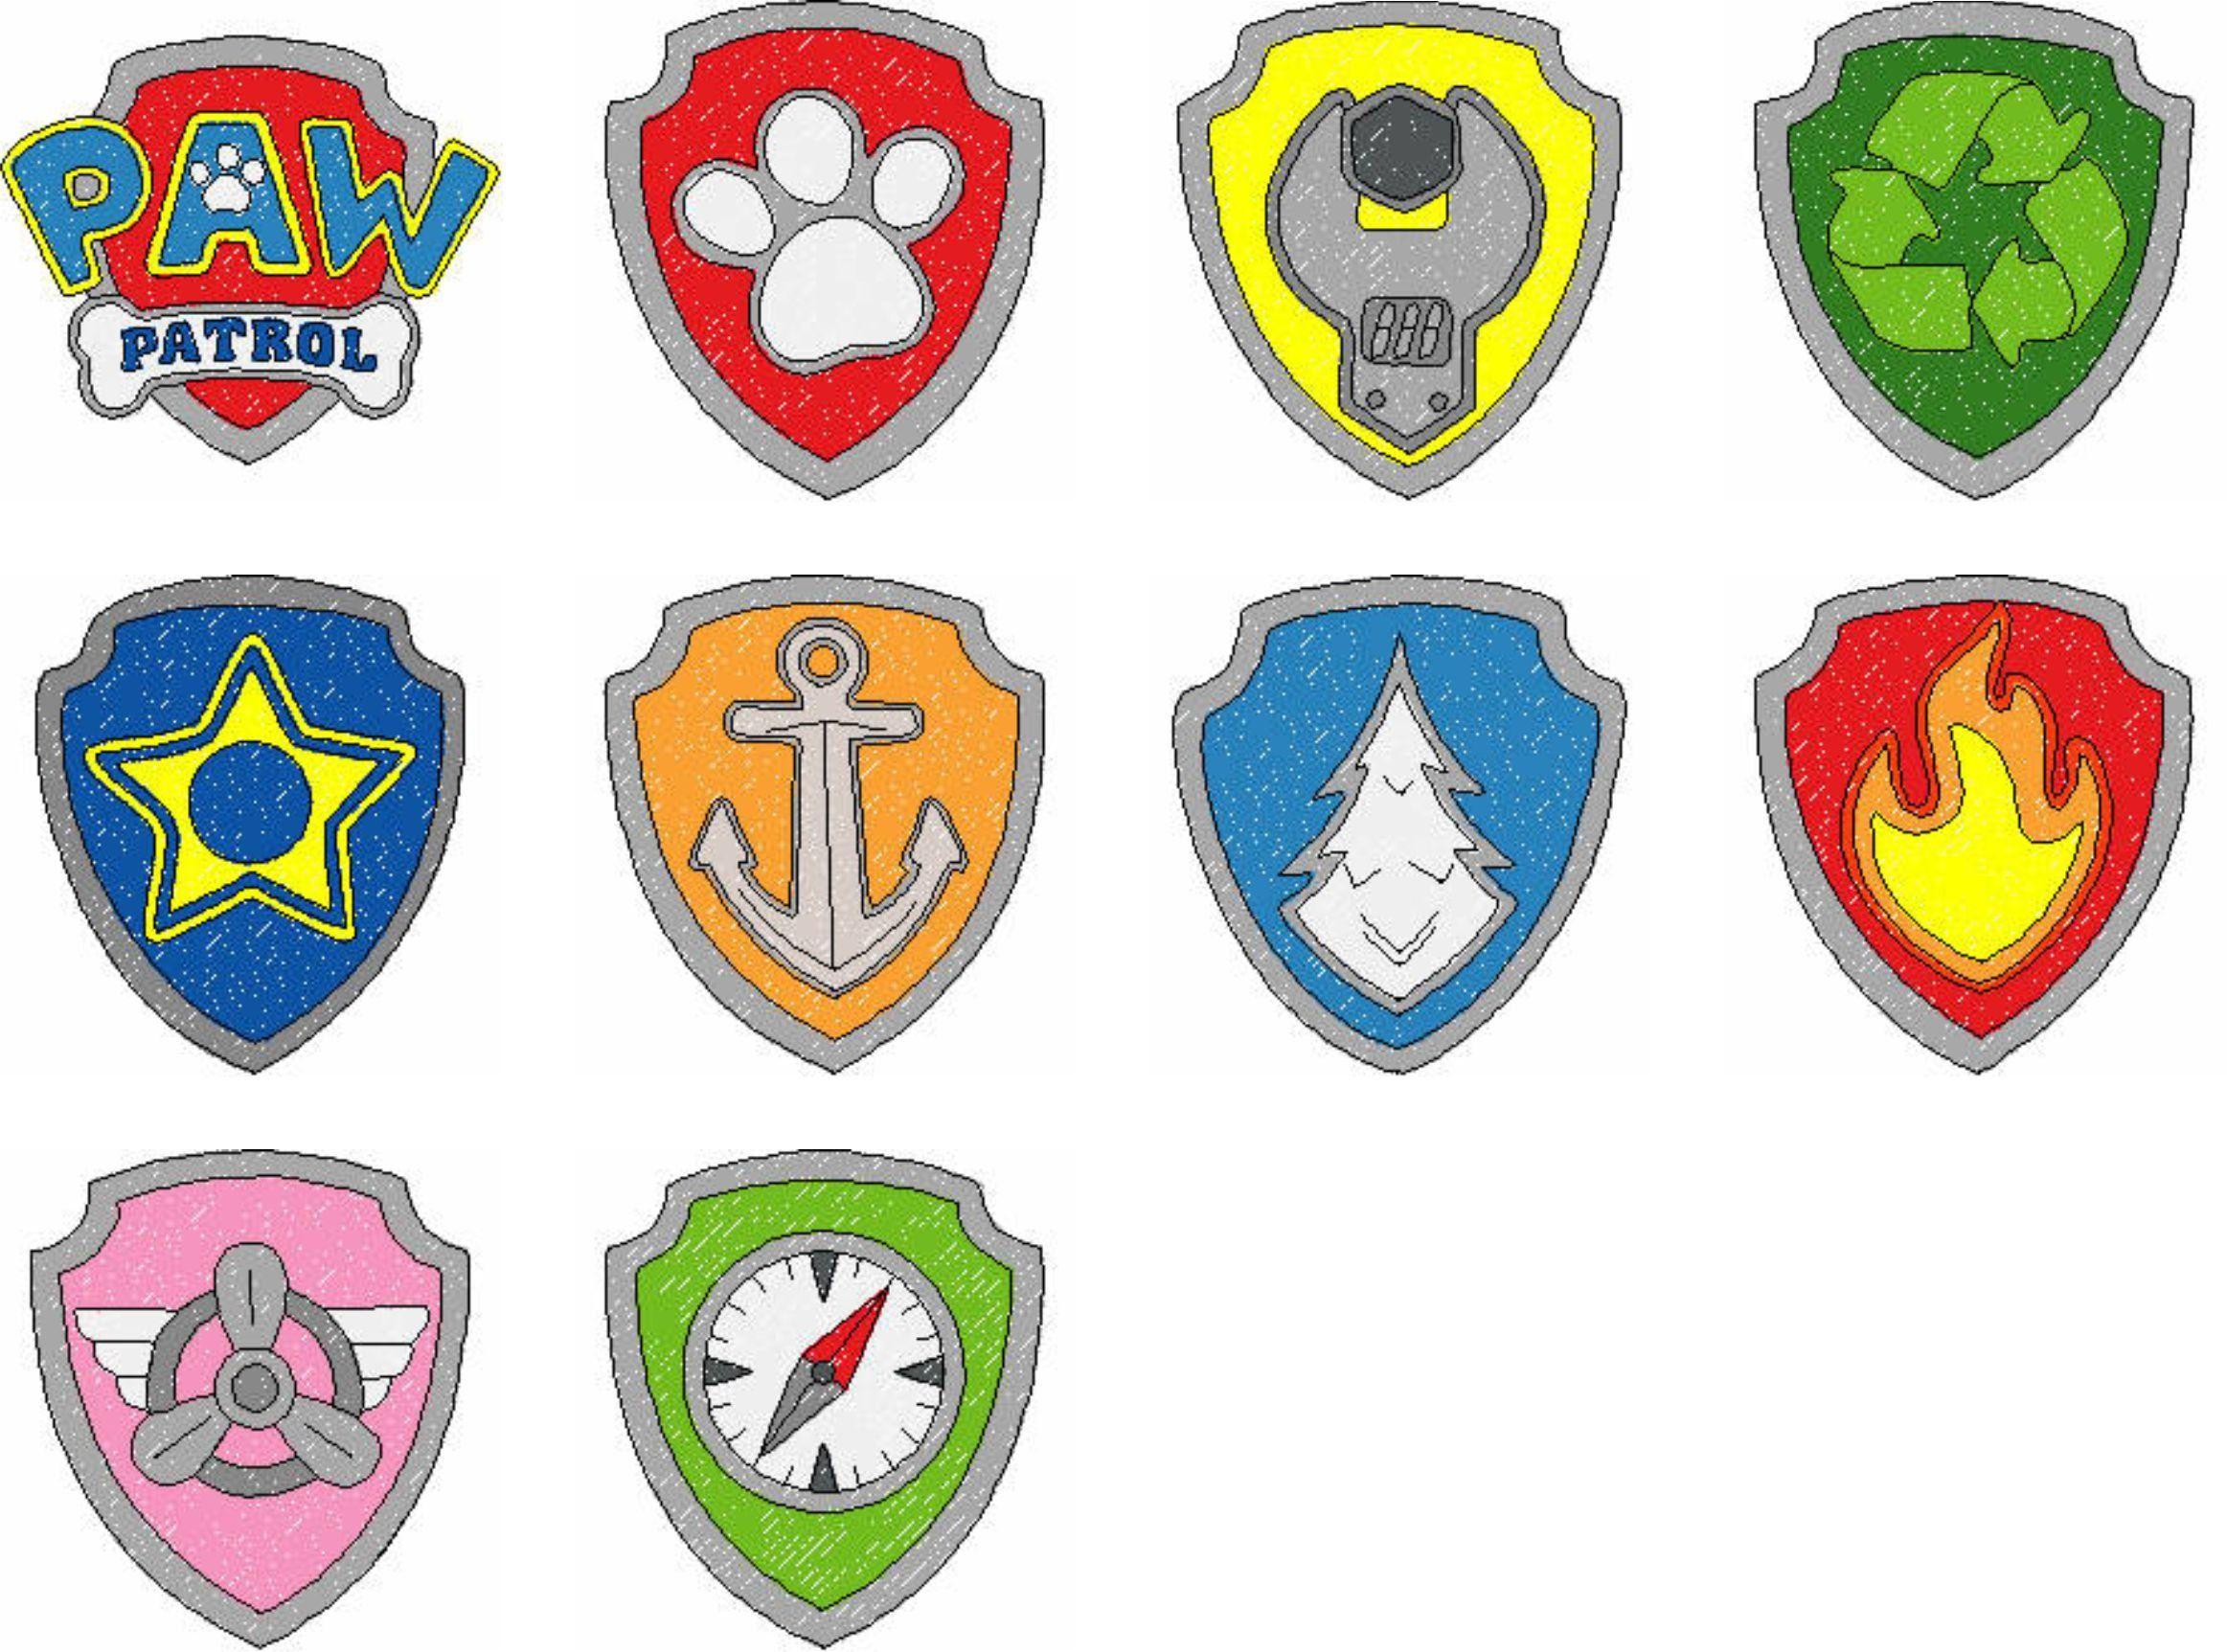 Paw Patrol Badges Paw patrol coloring, Paw patrol badge